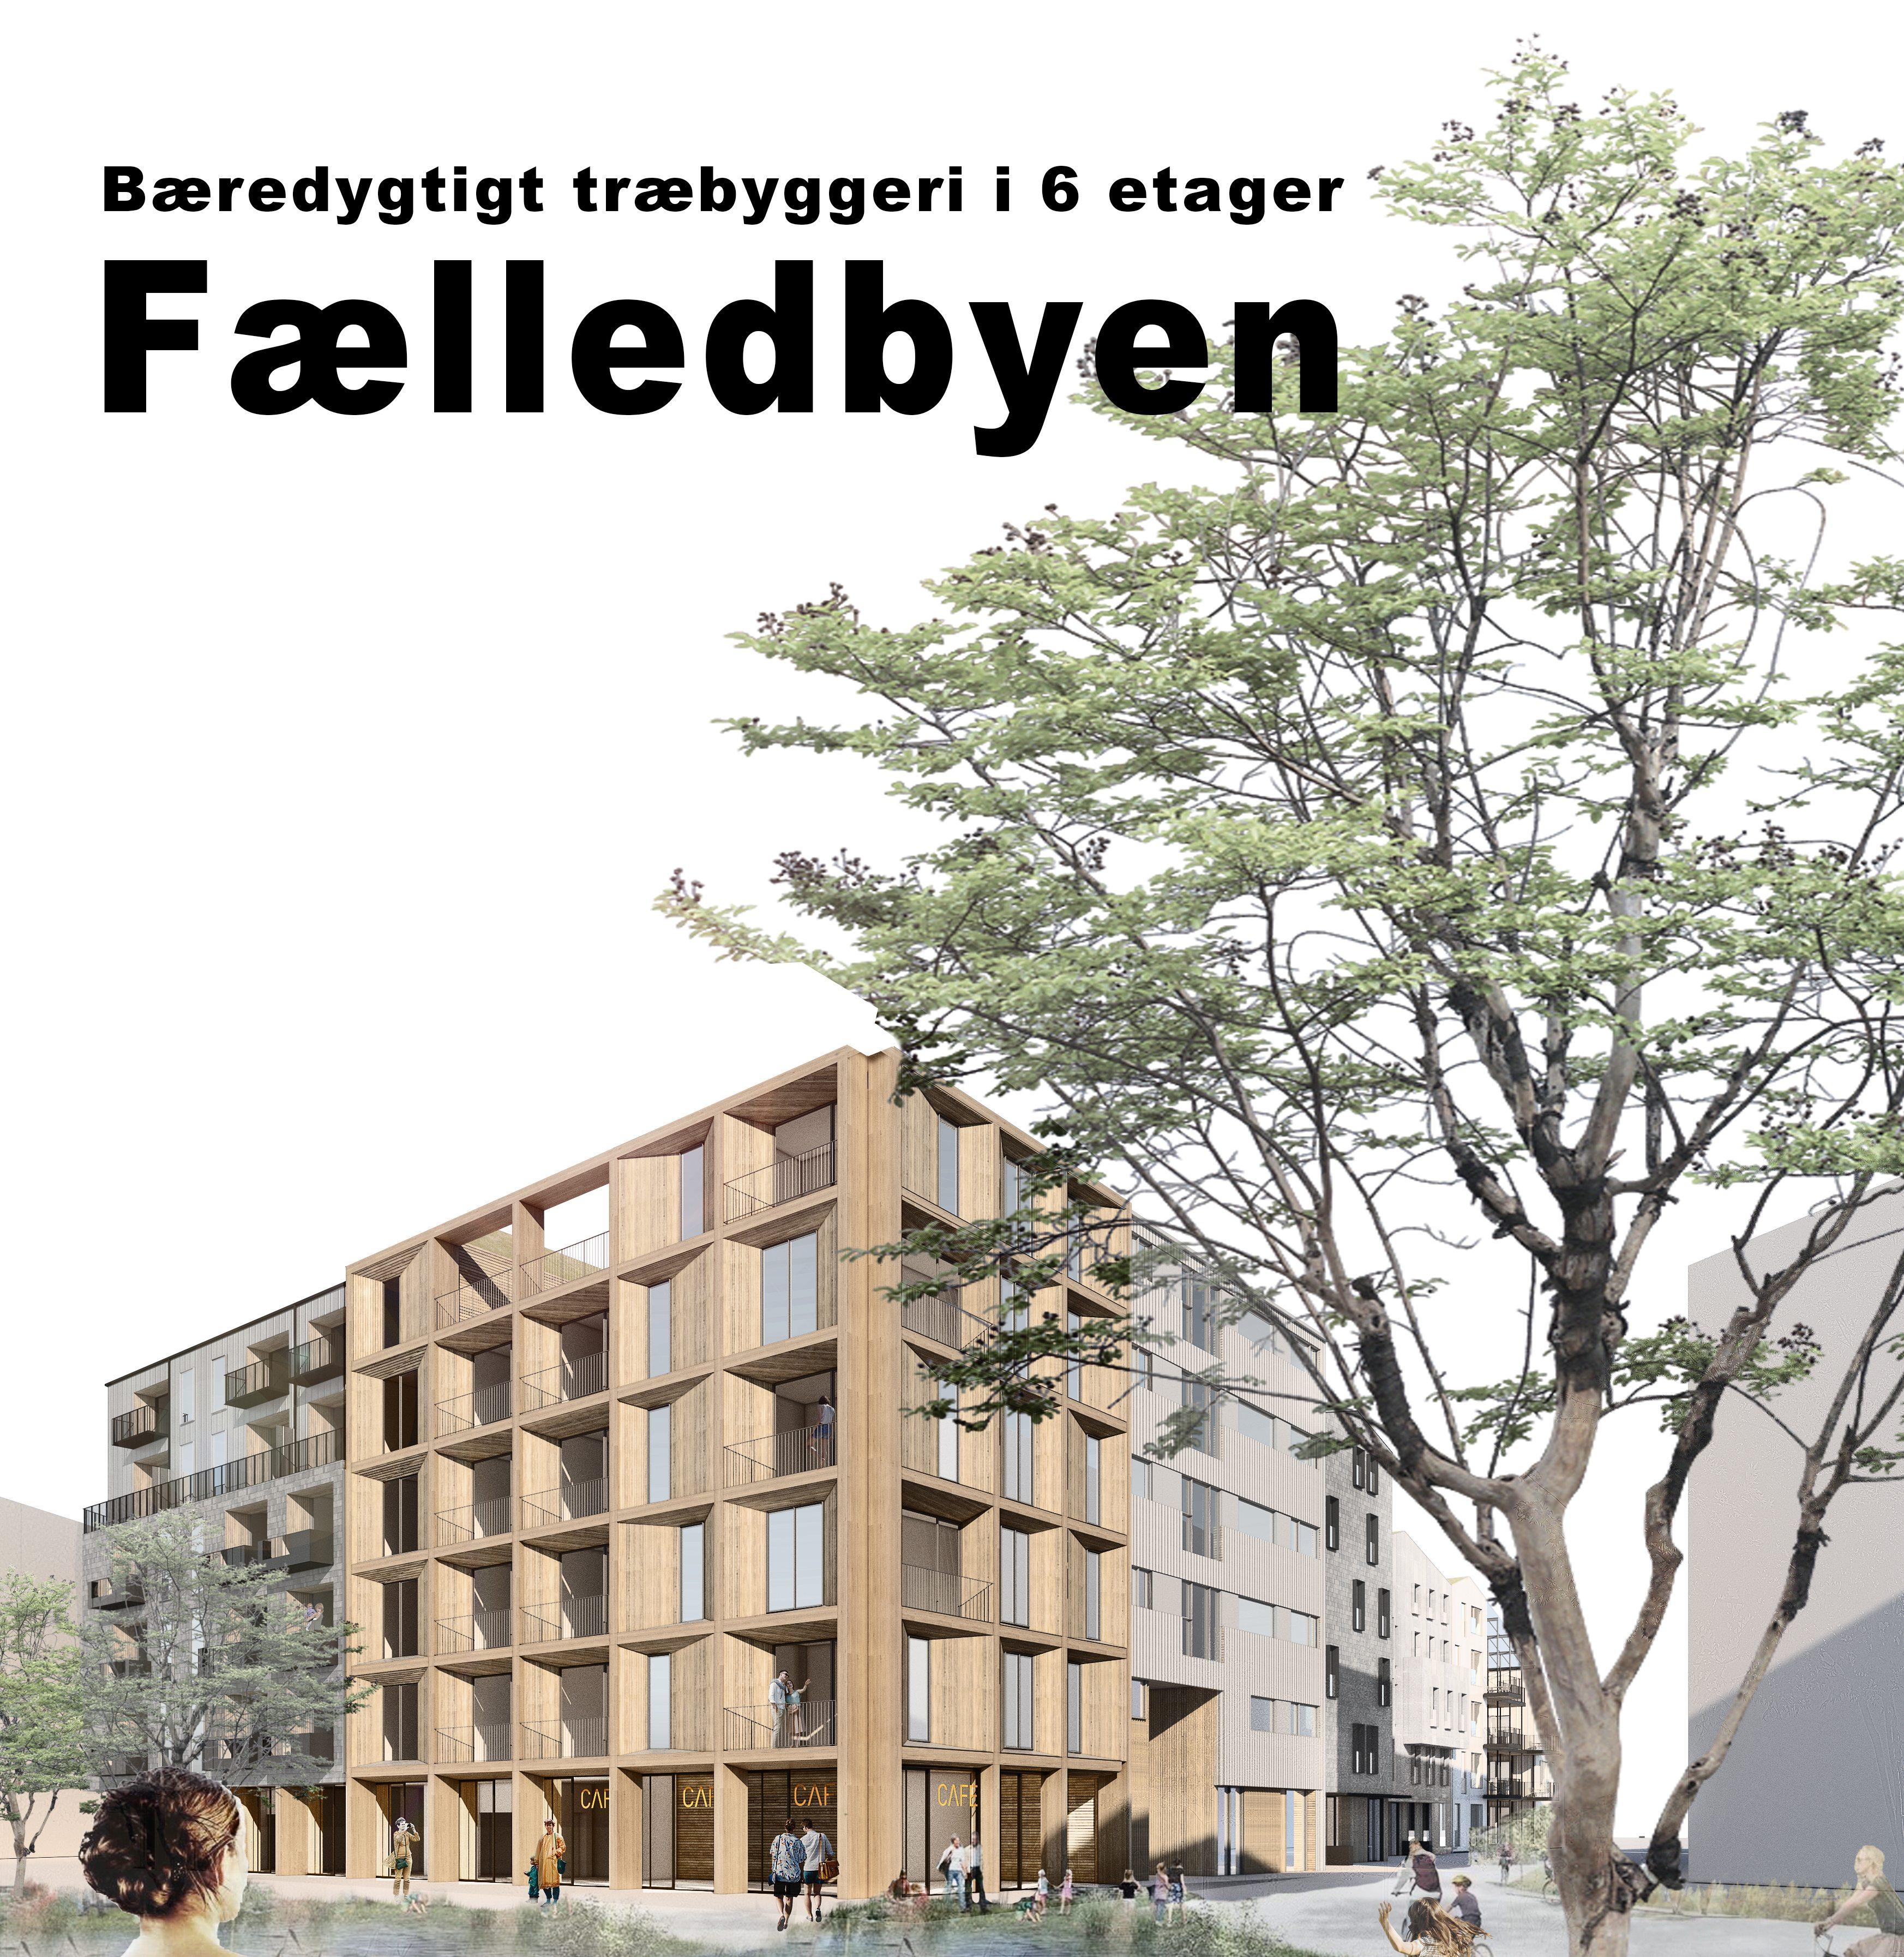 Fælledbyen-ONV-arkitekter-prefab-Pension-Danmark-2